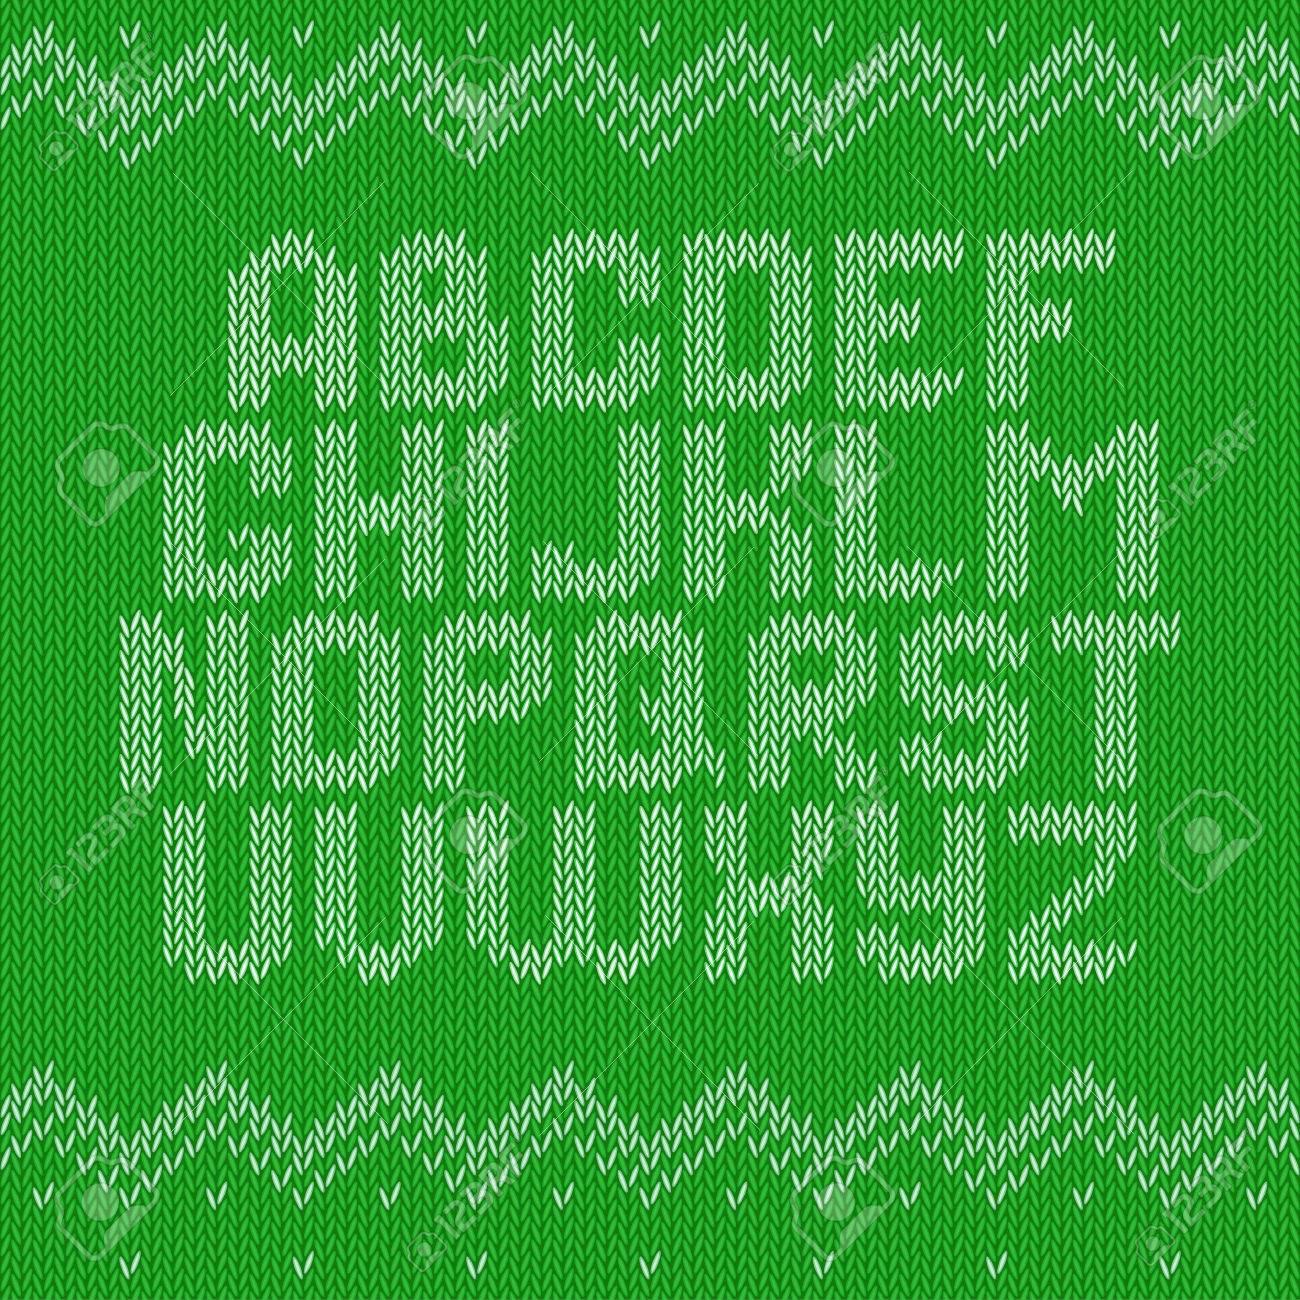 Knitted Alphabet On Green Background Christmas Crochet Font